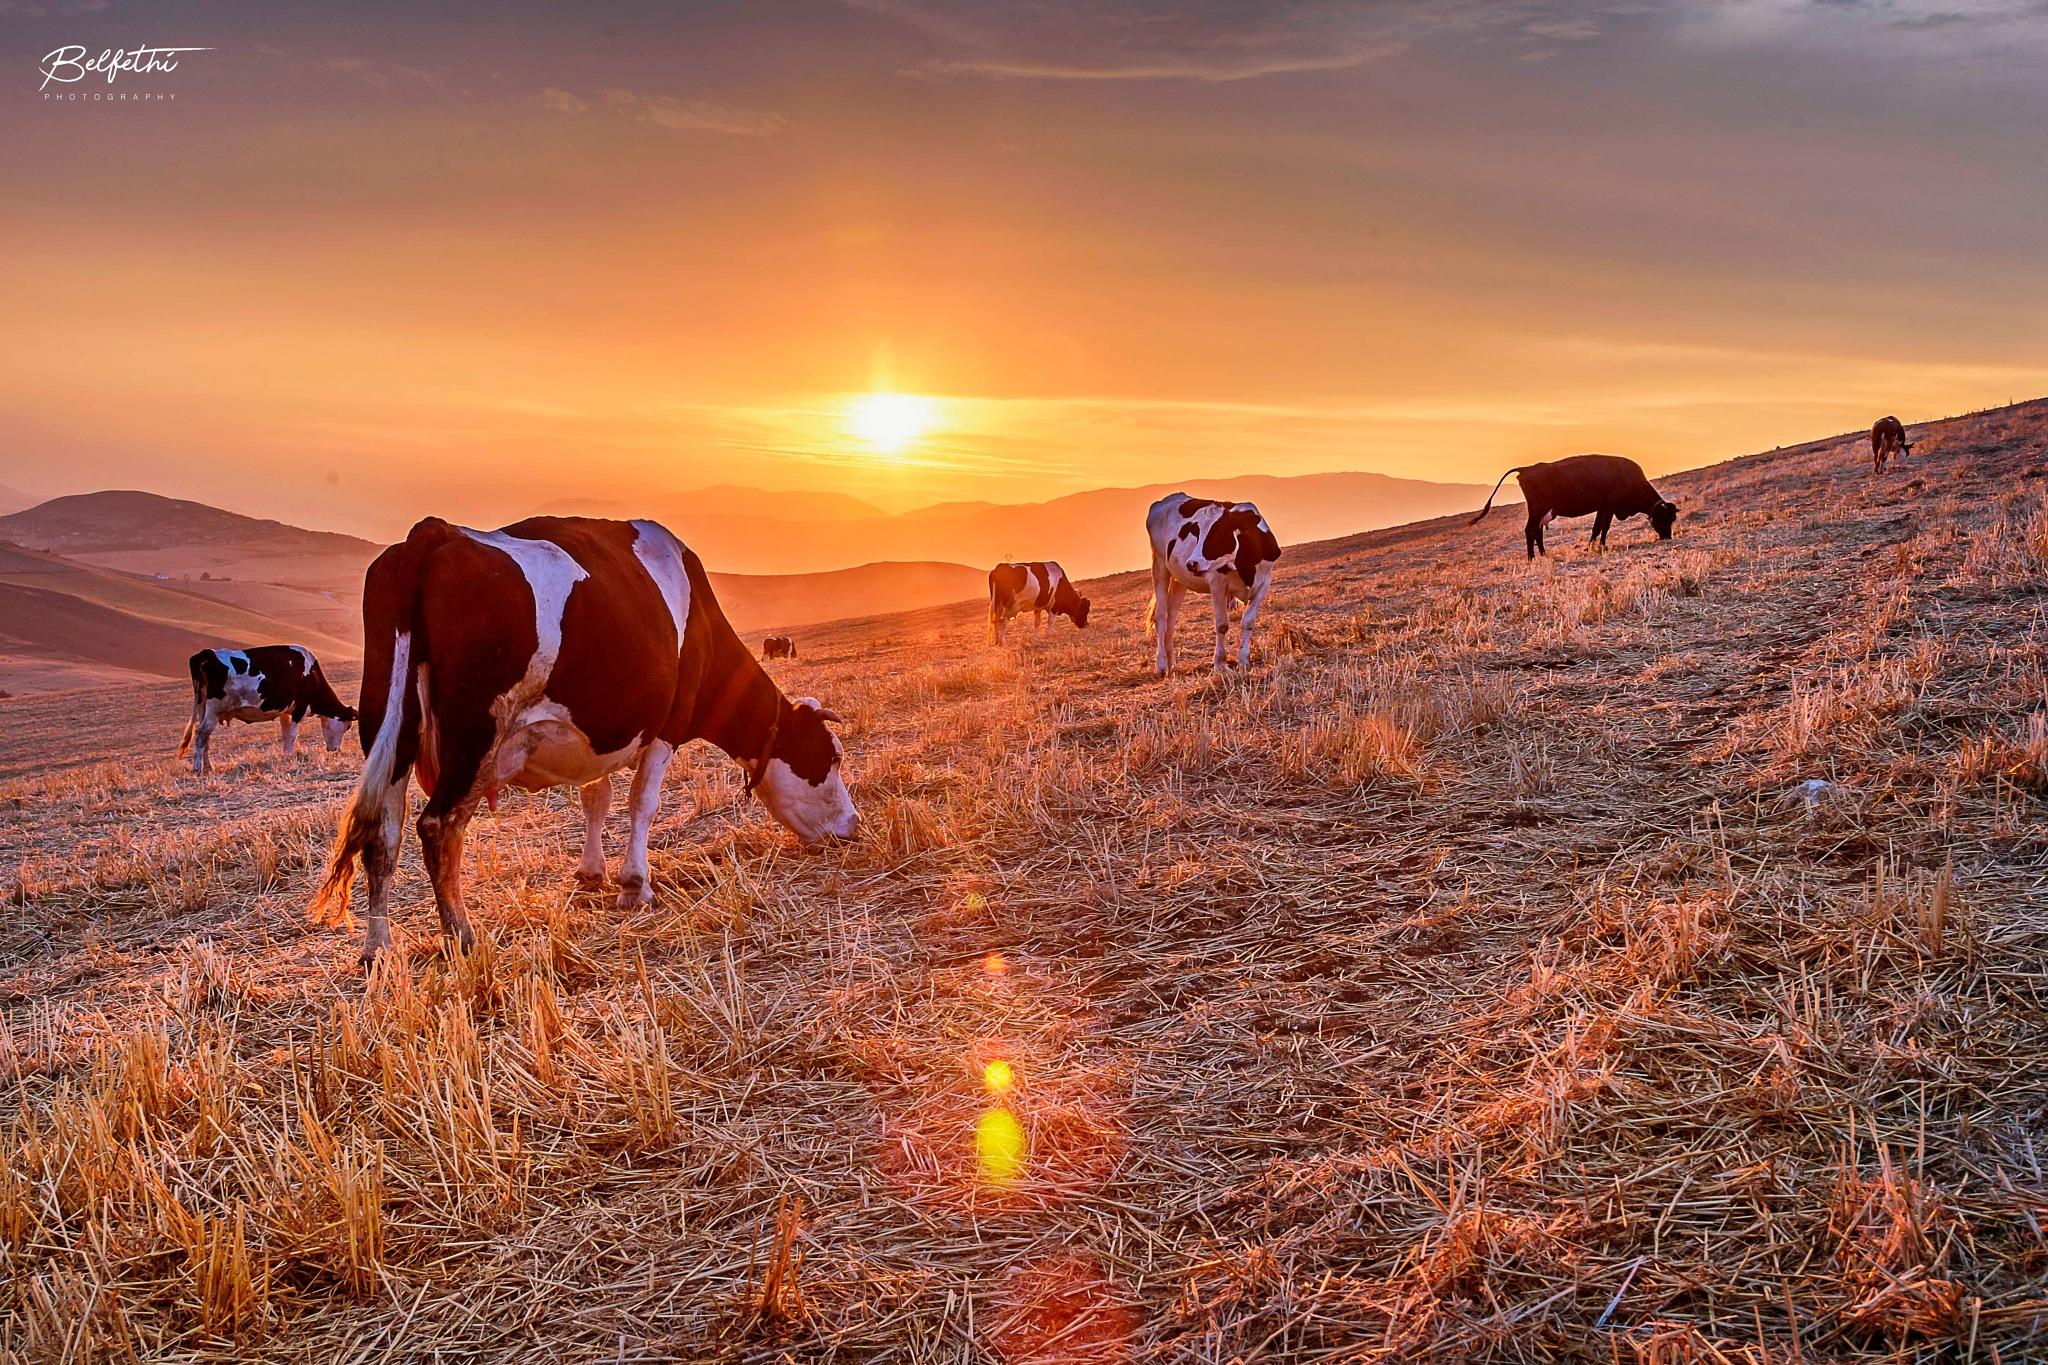 Cows by Noureddine Belfethi